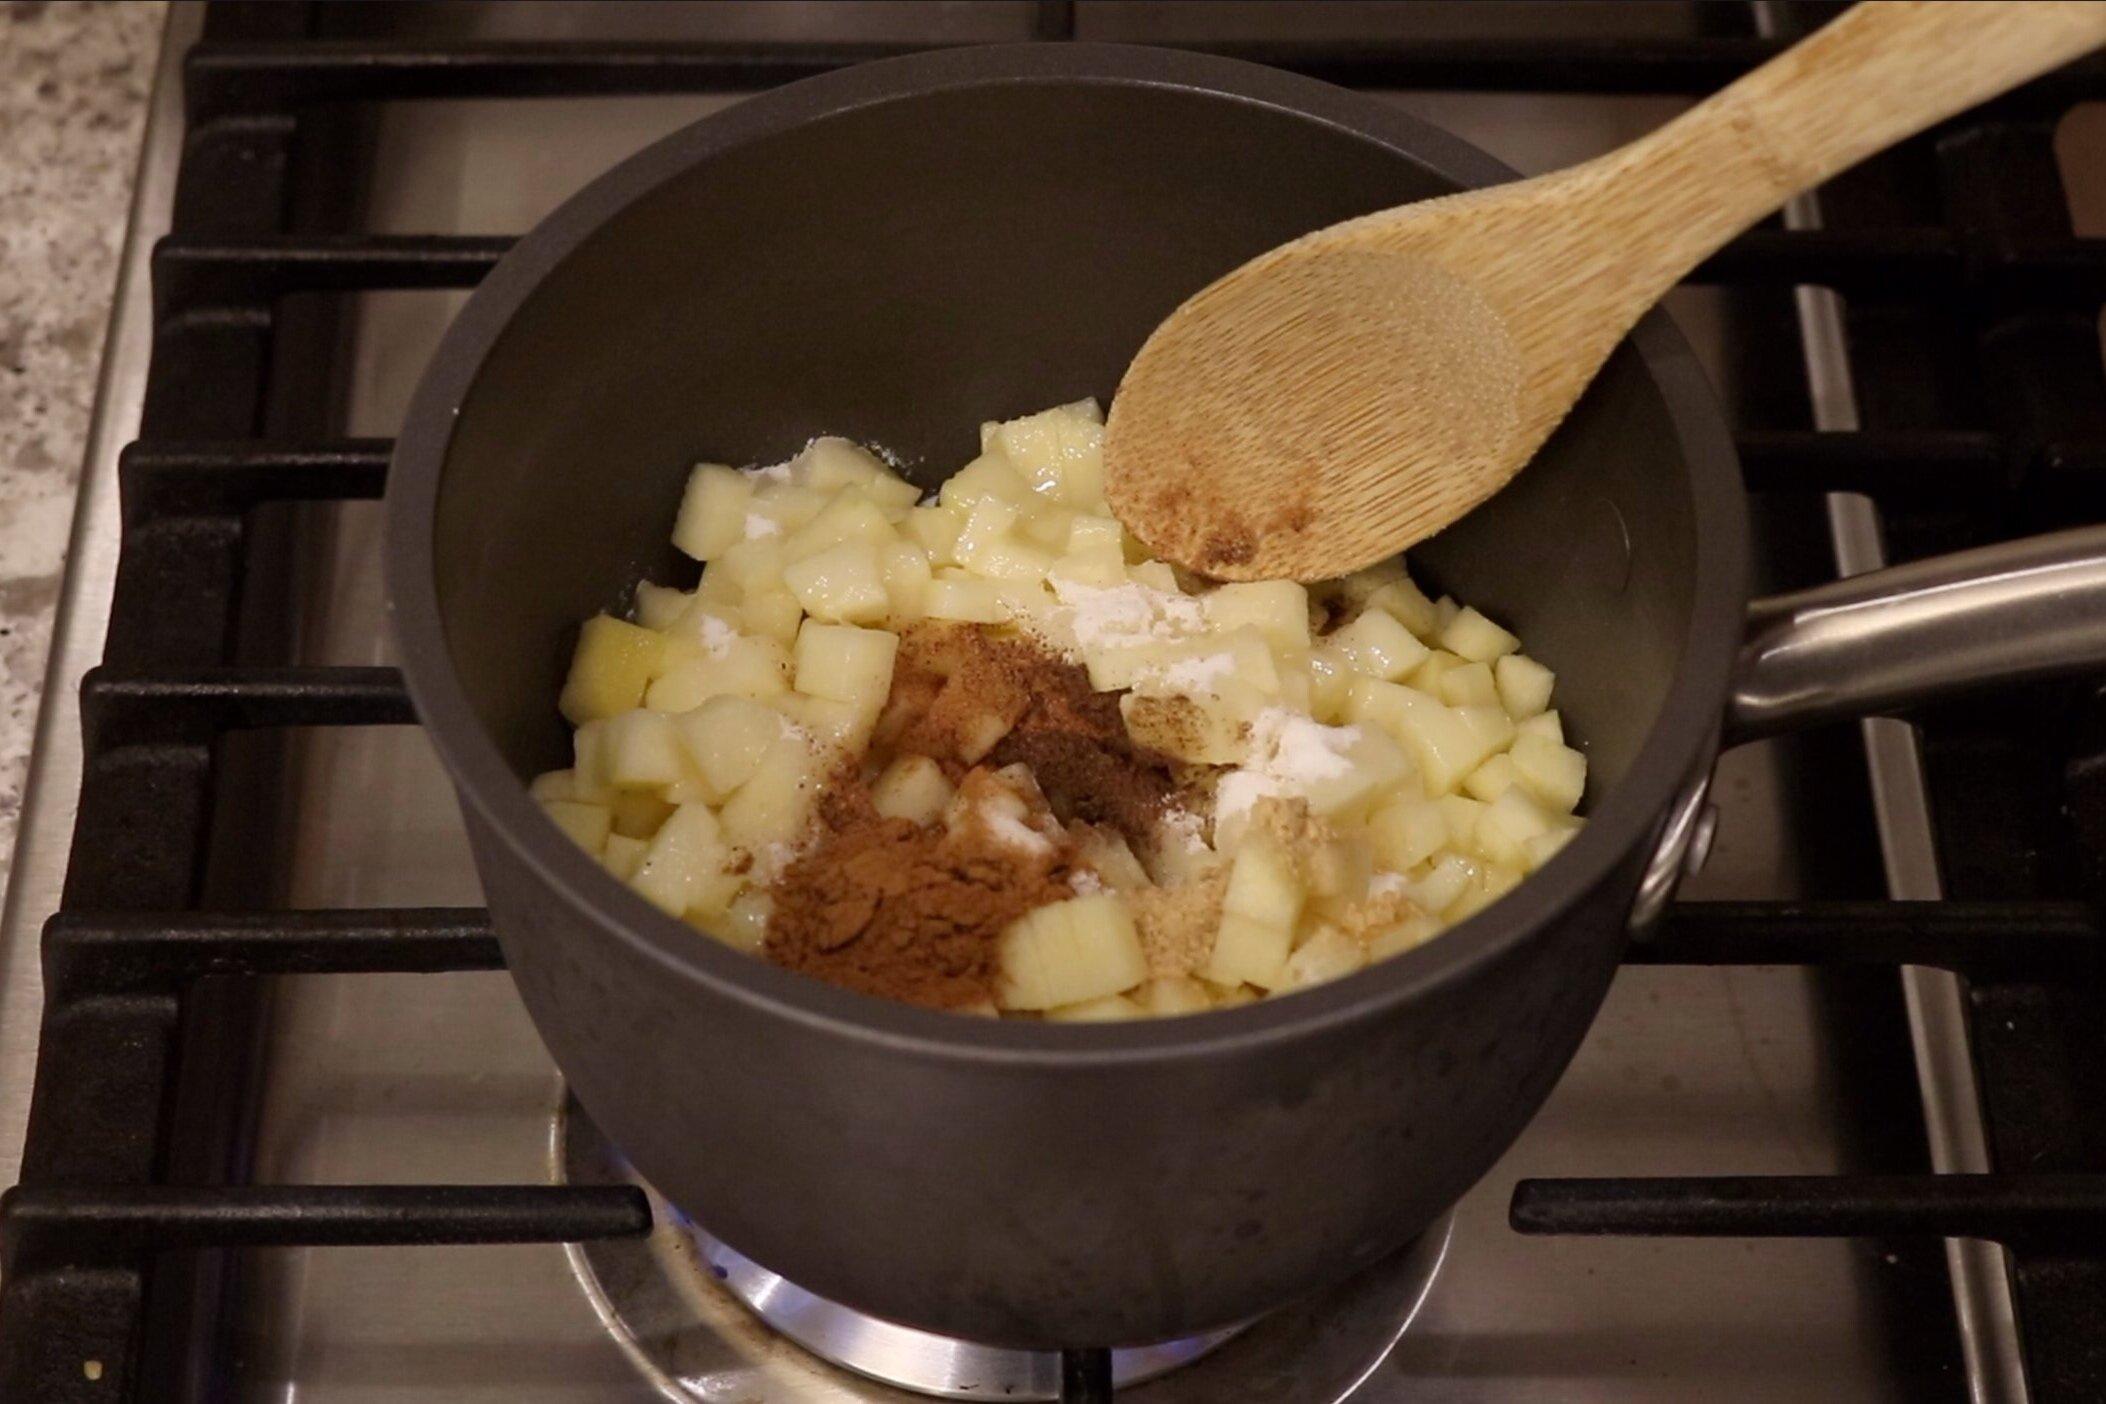 1. In a medium saucepan, add the apples, sugar, lemon juice, cinnamon, nutmeg, ginger and allspice. -